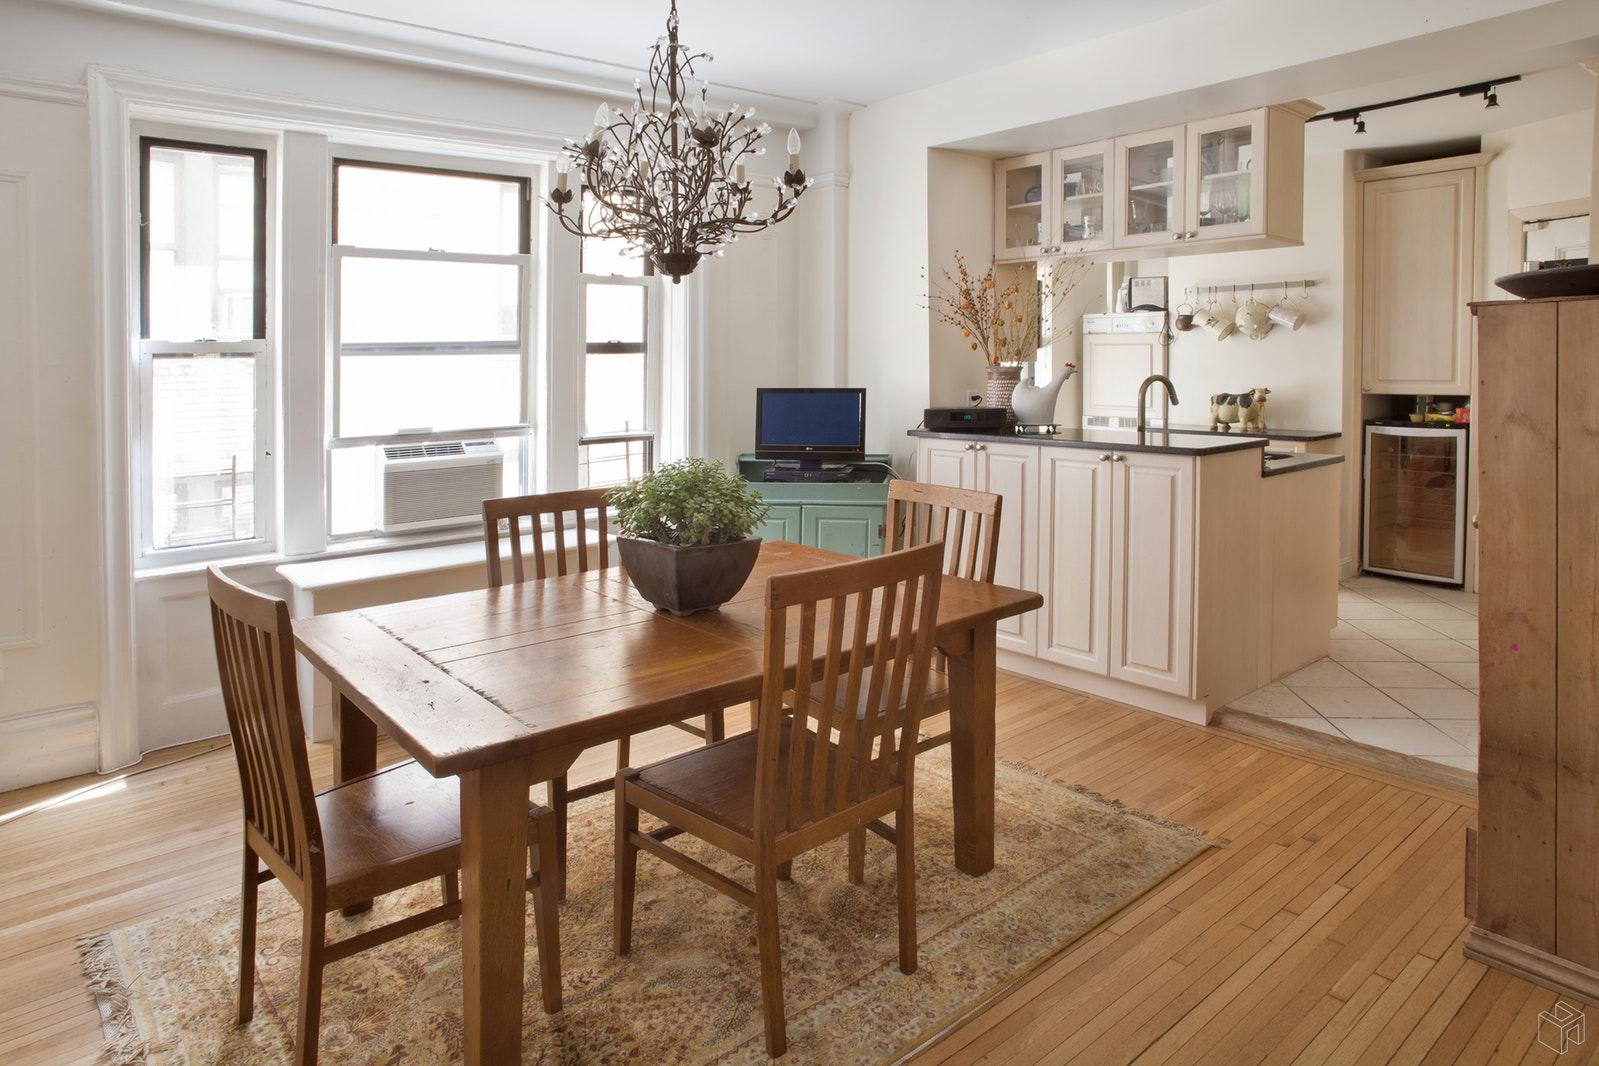 40 WEST 84TH STREET 6B, Upper West Side, $5,300, Web #: 19534133